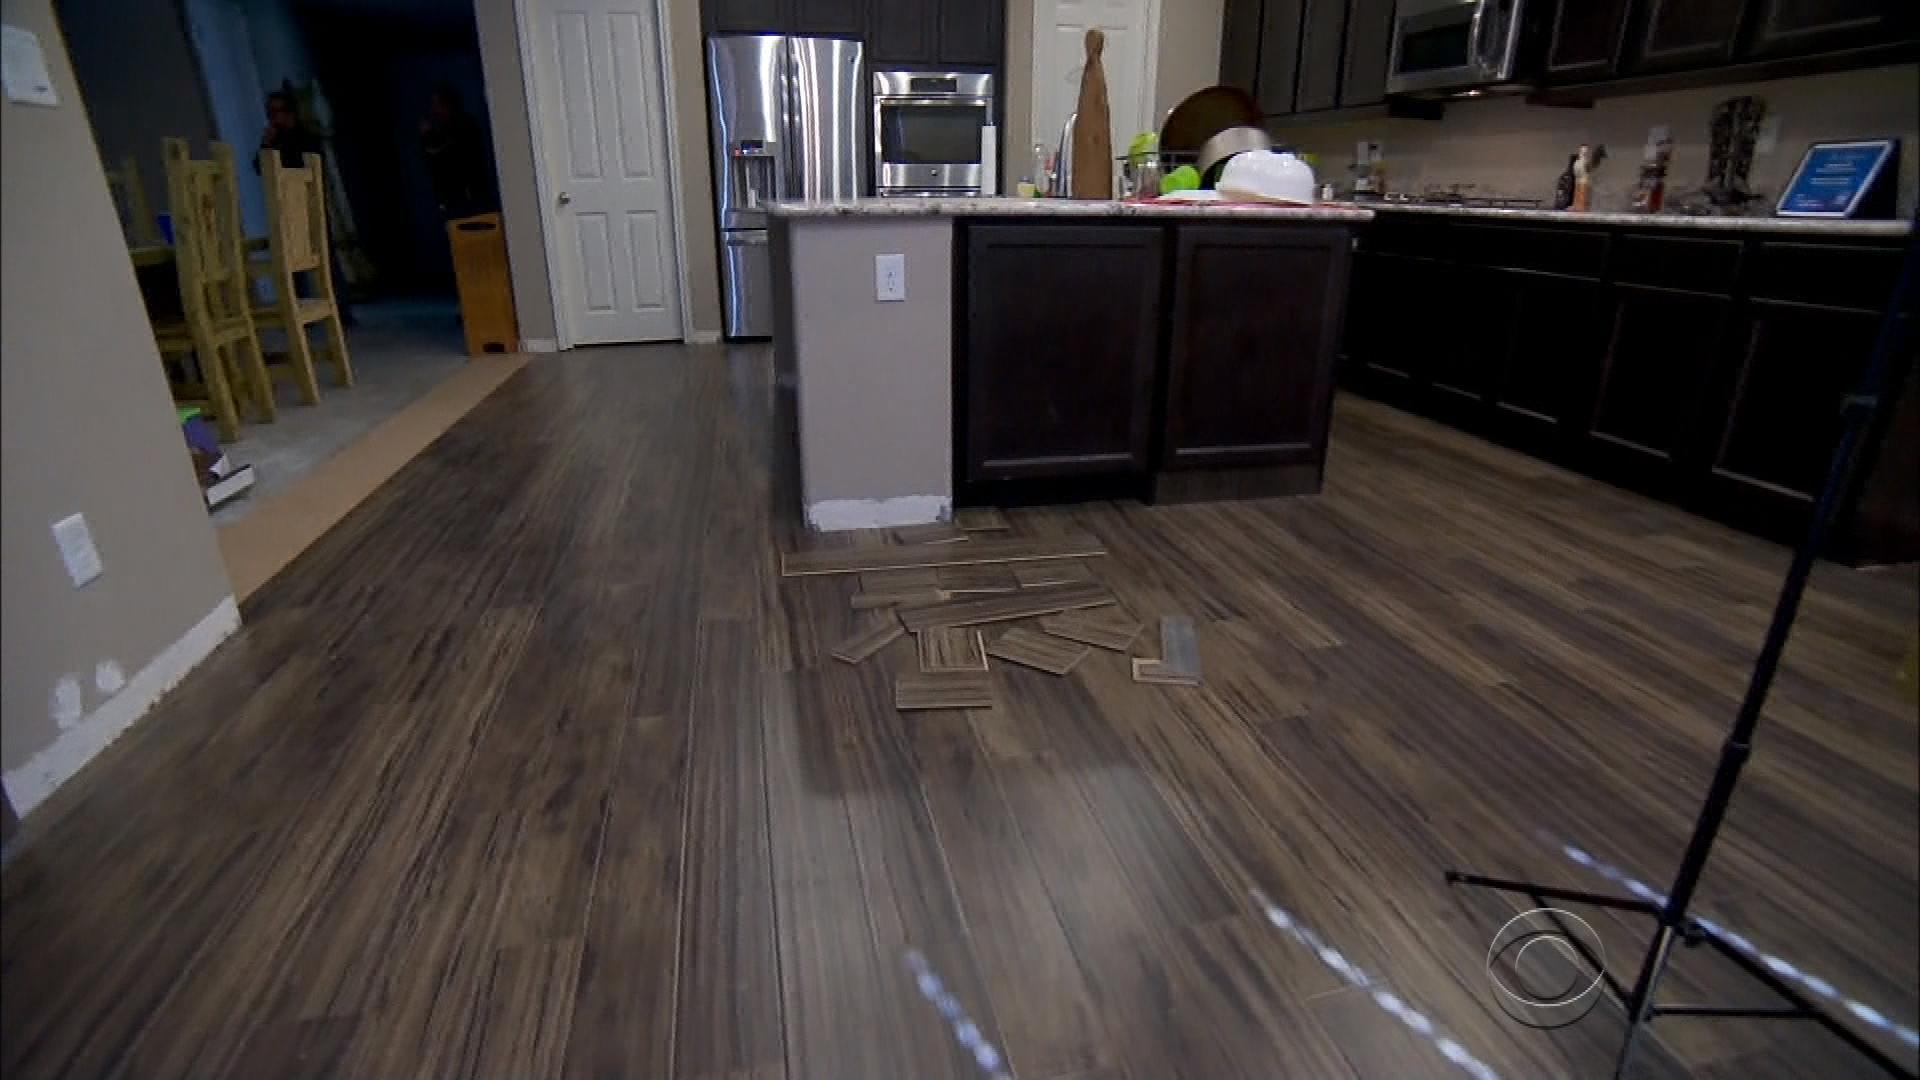 Lumber Liquidators customers still testing laminate floors